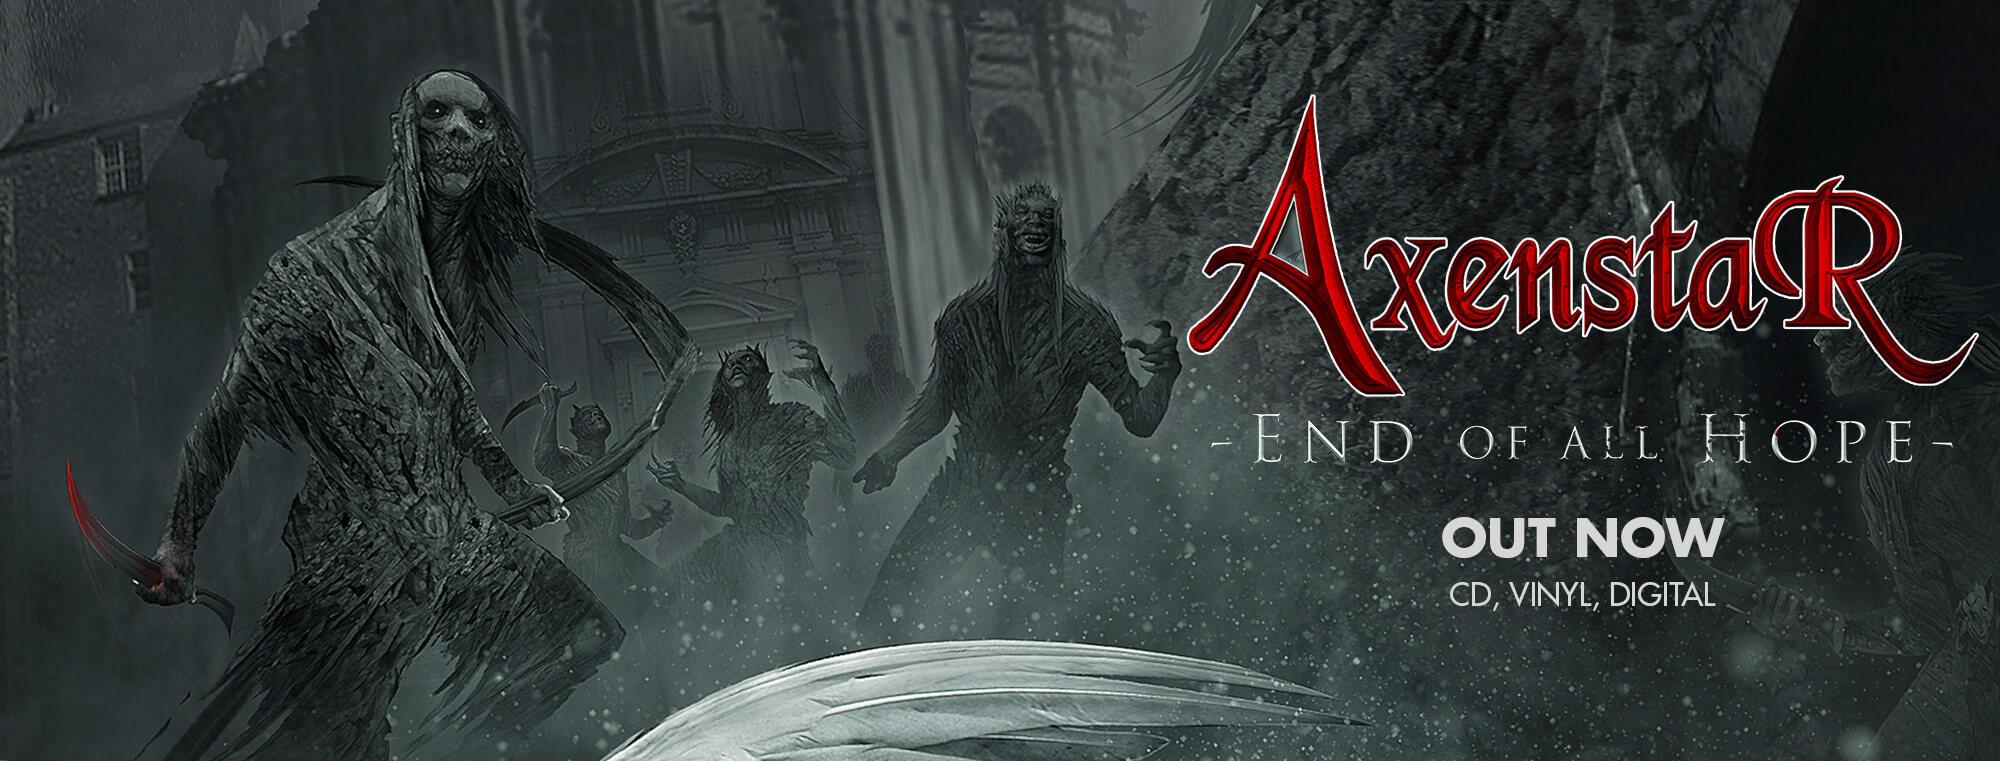 Axenstar - End Of All Hope Promo